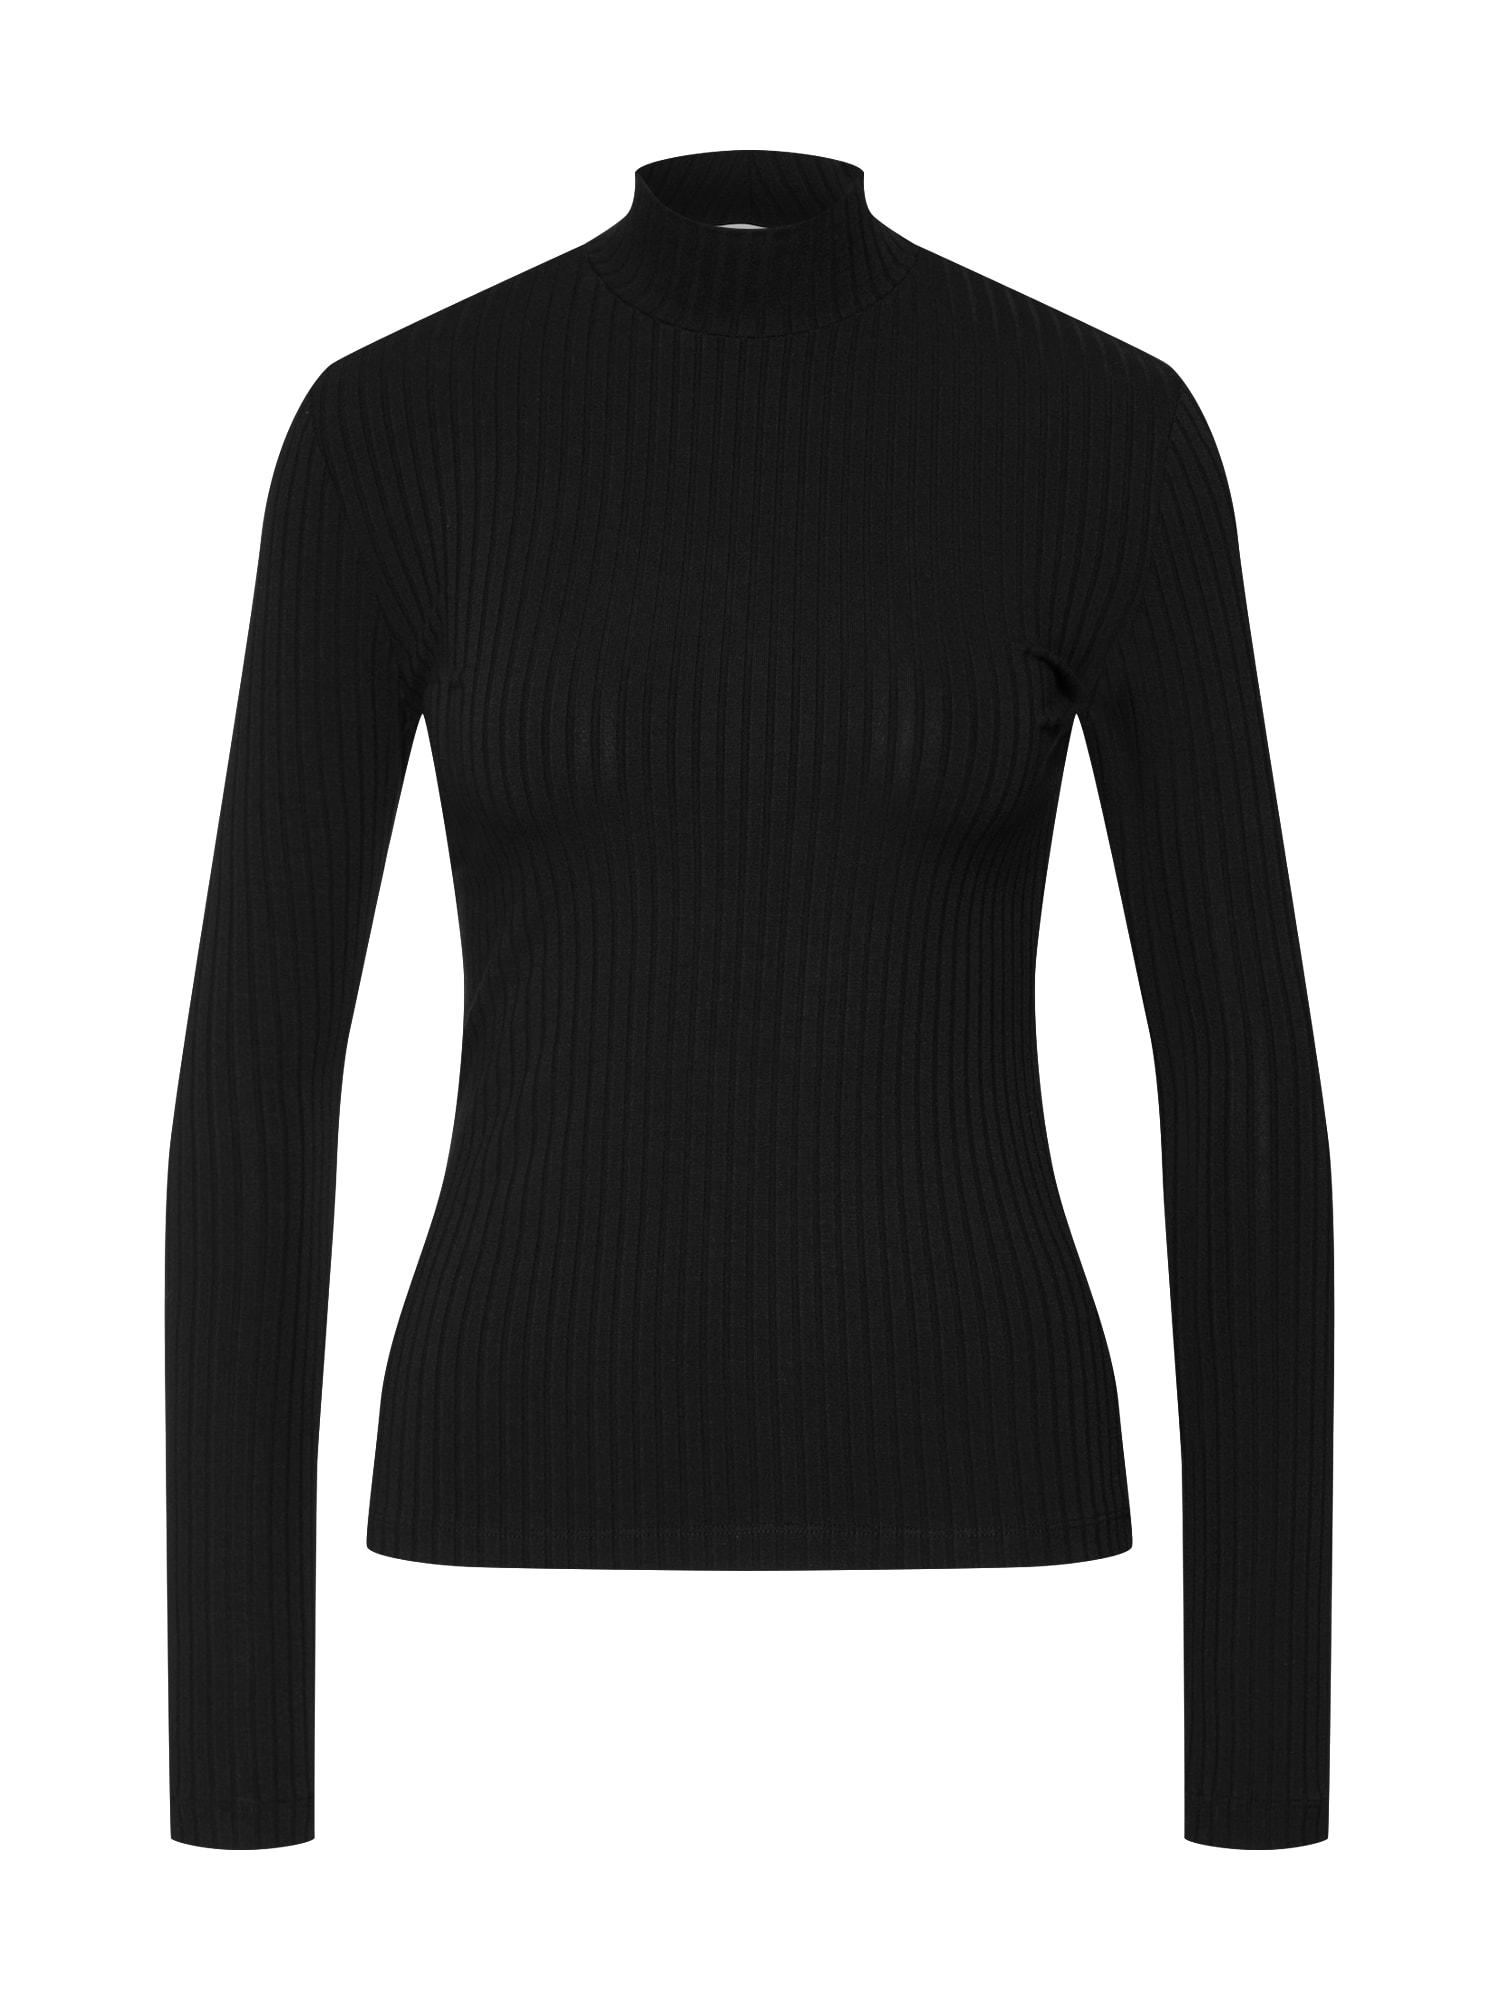 Tričko Manon černá EDITED